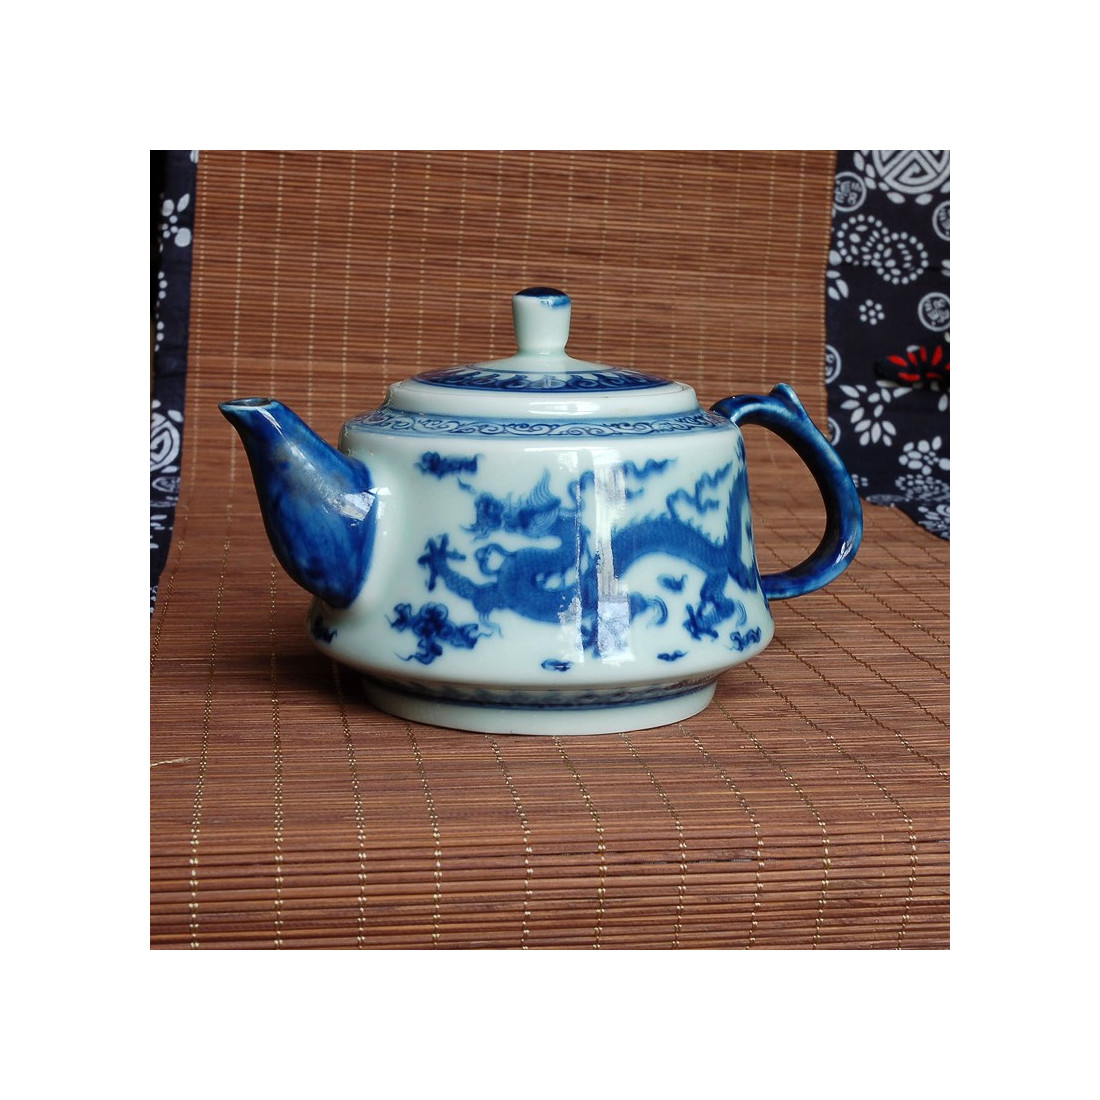 """Дракон"" — чайник из цзиндэчжэньского фарфора"